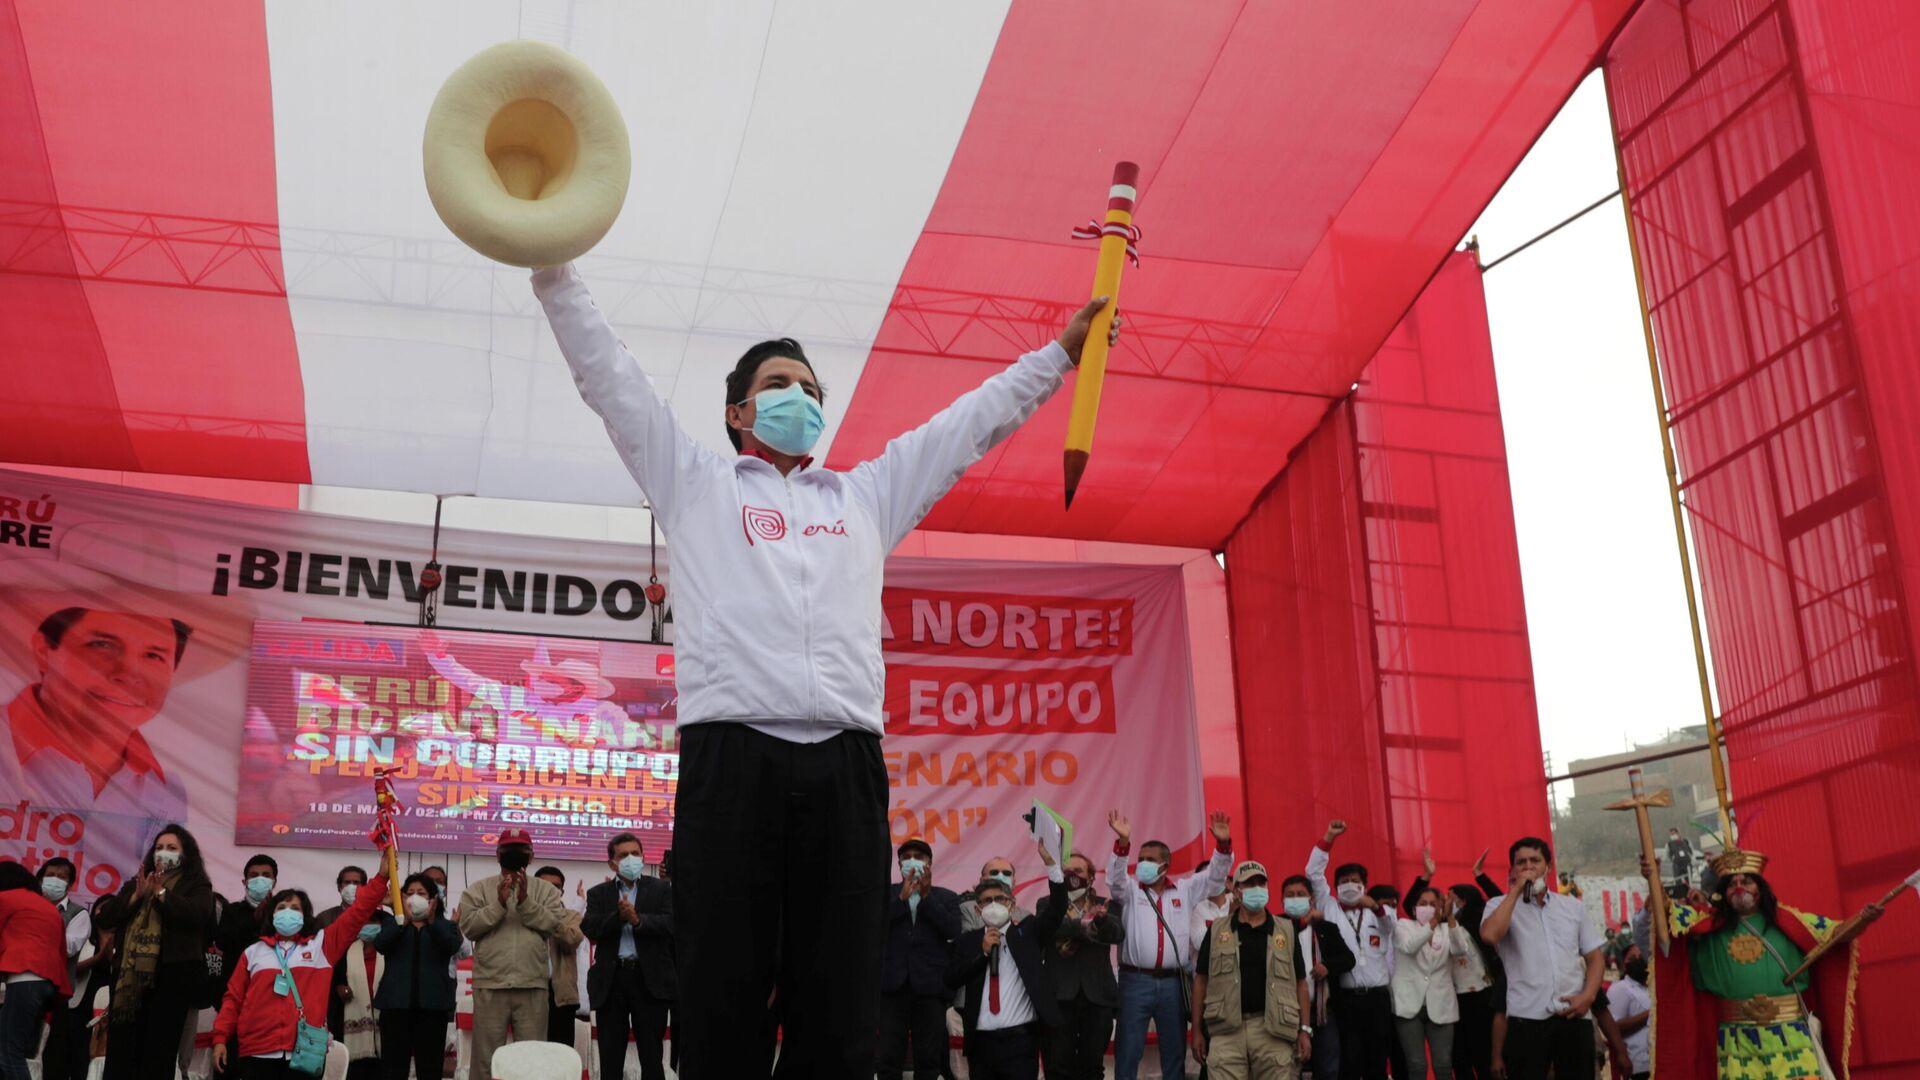 Pedro Castillo, candidato a la presidencia de Perú - Sputnik Mundo, 1920, 18.05.2021